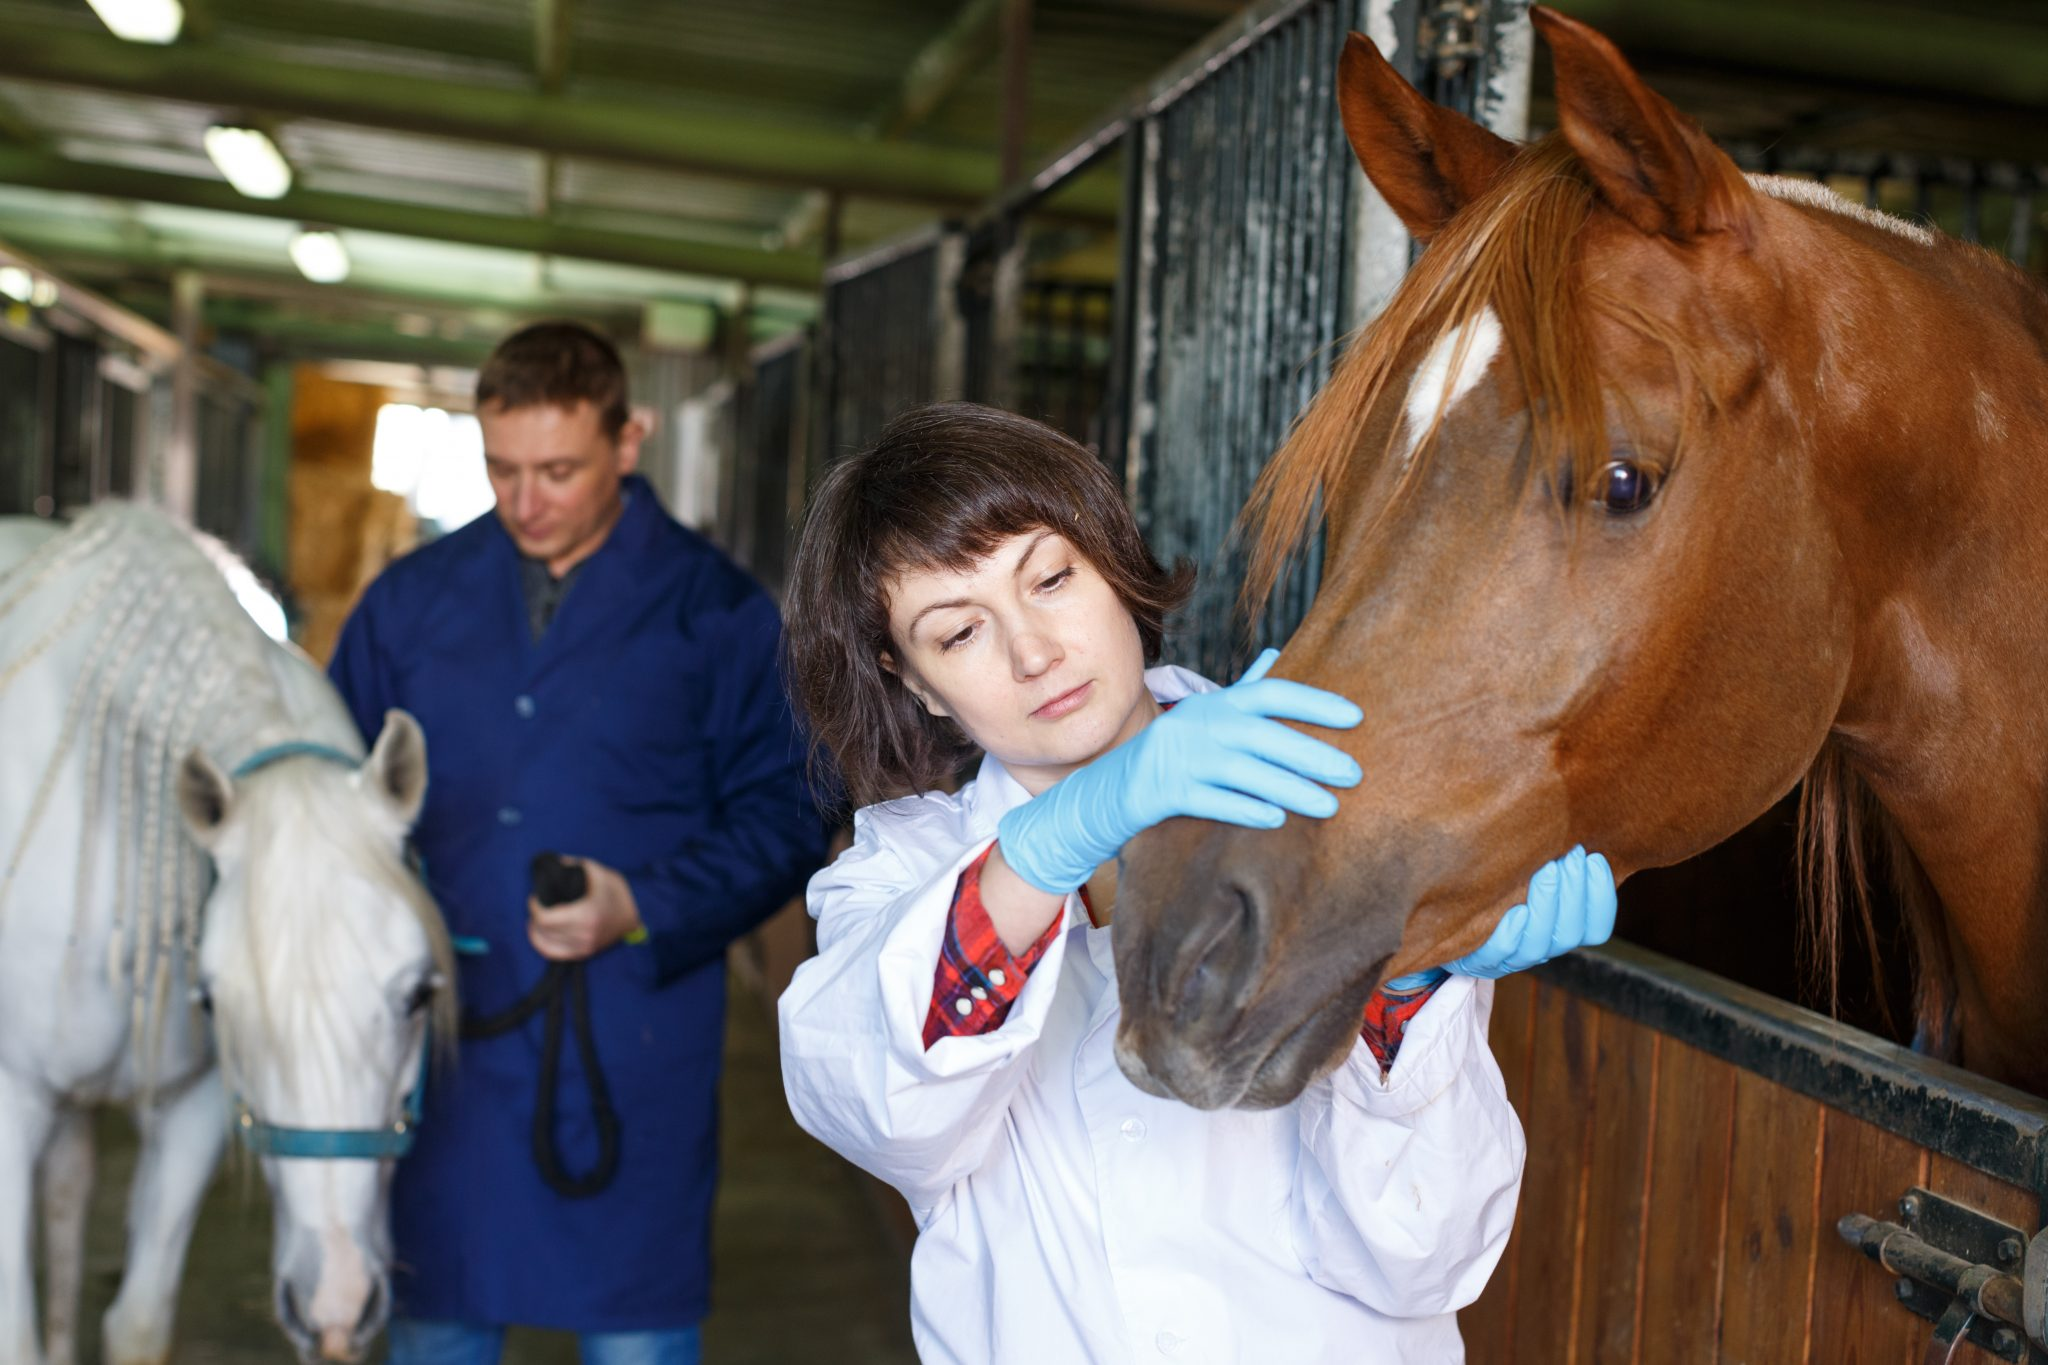 Female Vet Giving Medical Exam to a Horse